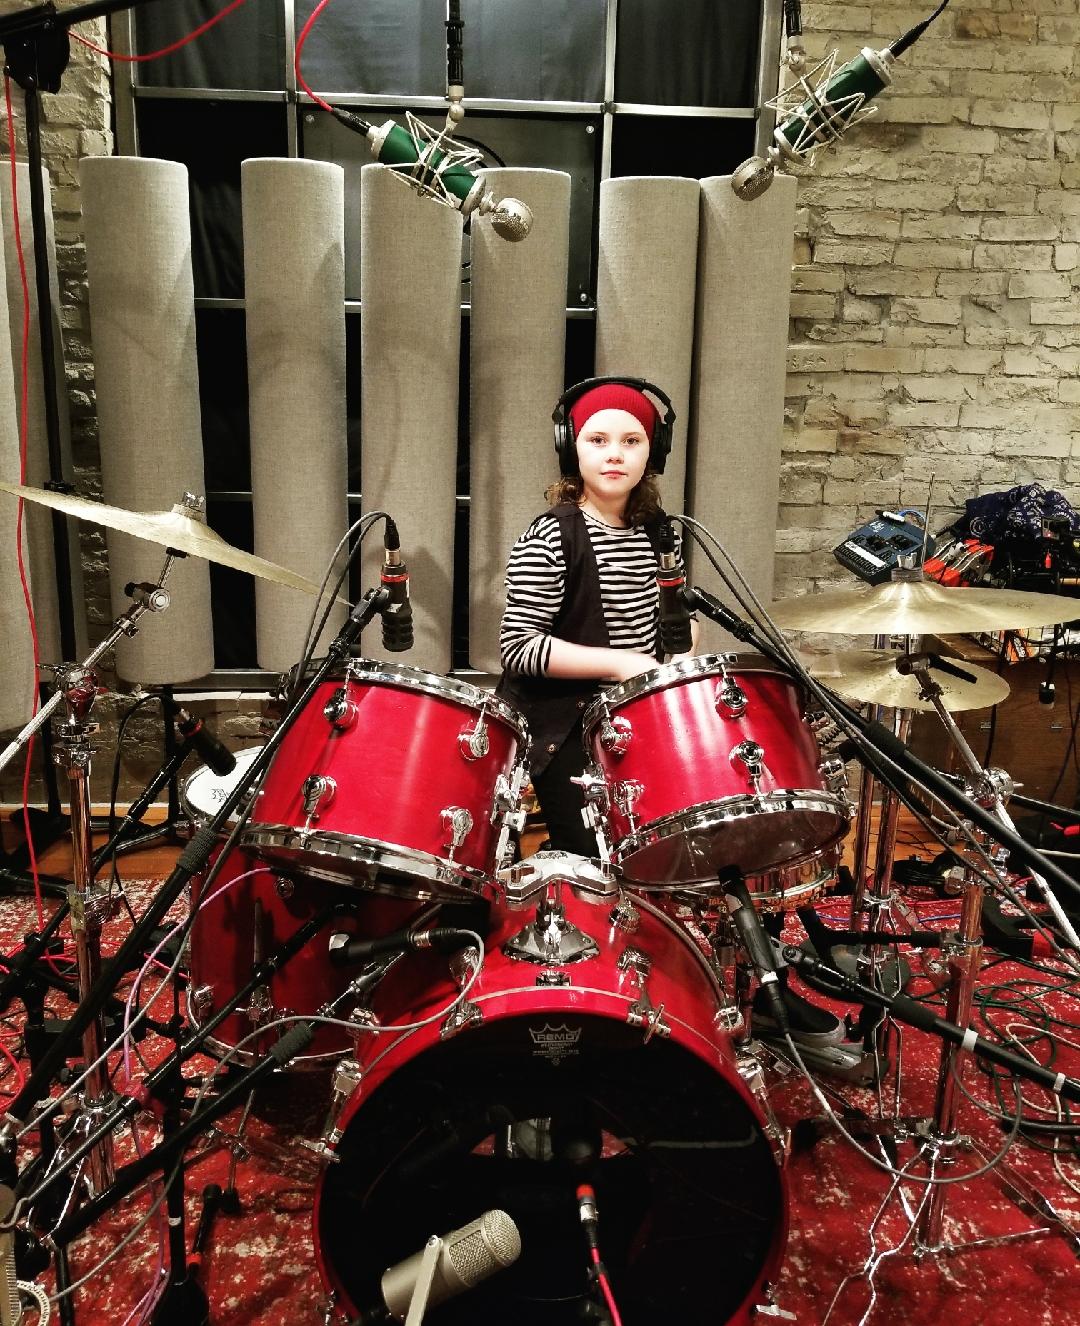 MILANA_Recording Session.jpeg